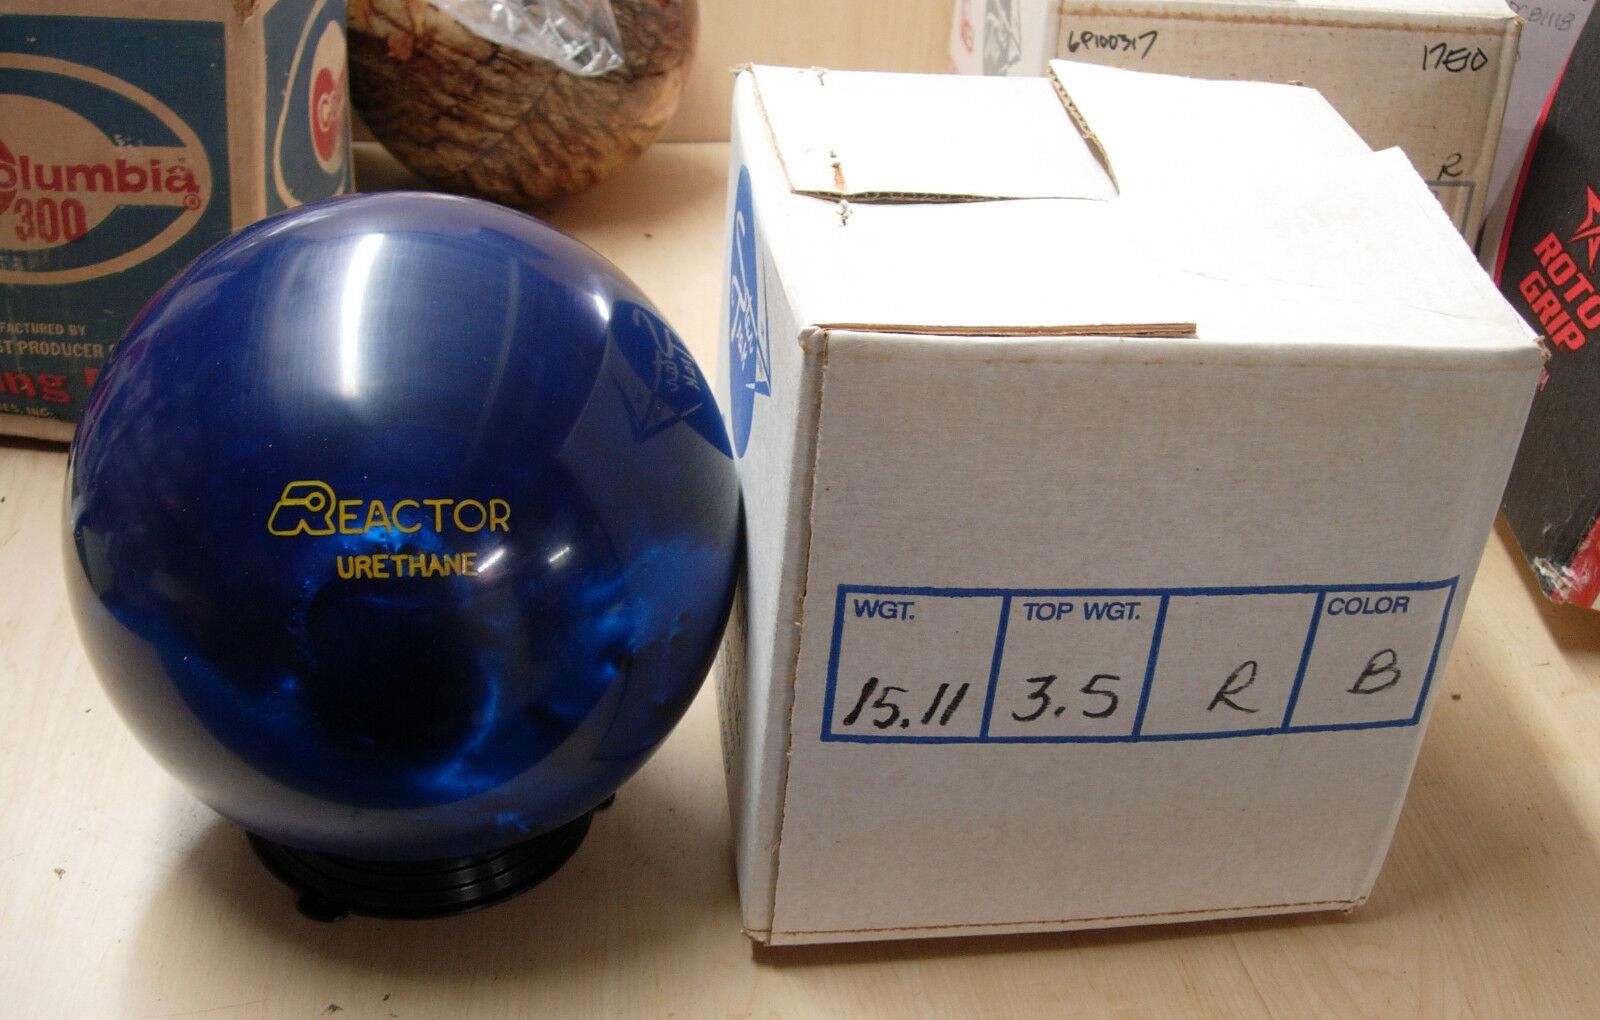 15.11, TW 3.5 1987 Star Trak REACTOR Urethane blueE Pearl, Ravenna Solon, Ohio